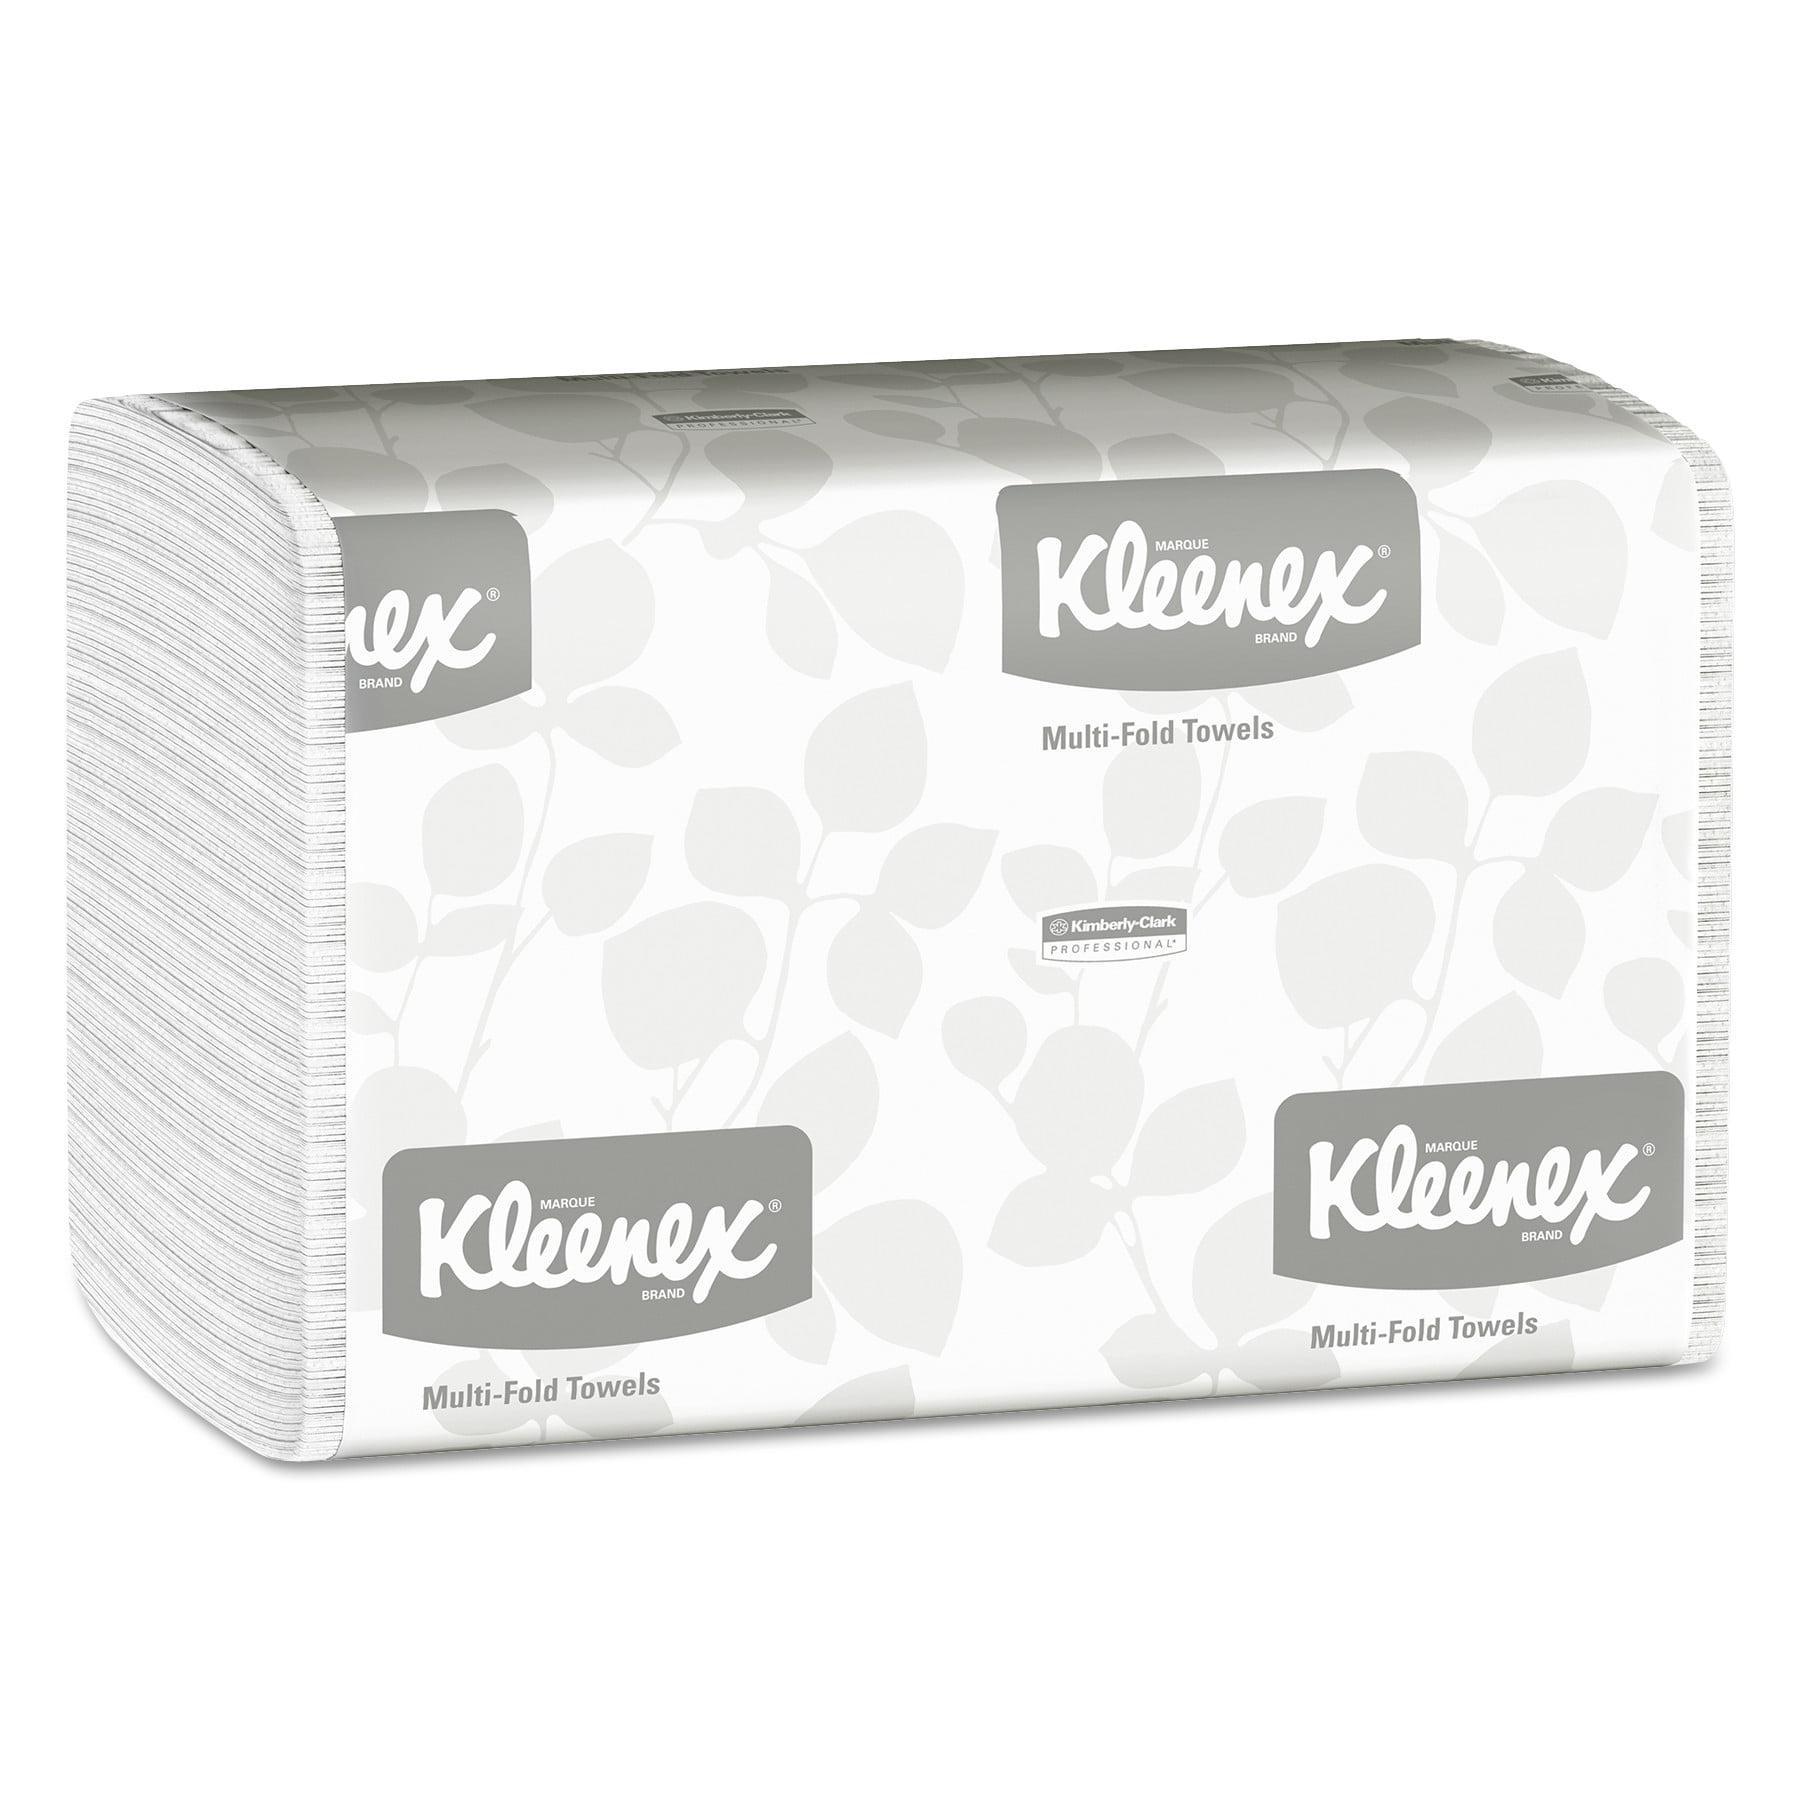 Kleenex Multi-Fold Paper Towels, 9 1/5 x 9 2/5, White, 150/Pack, 16 Packs/Carton